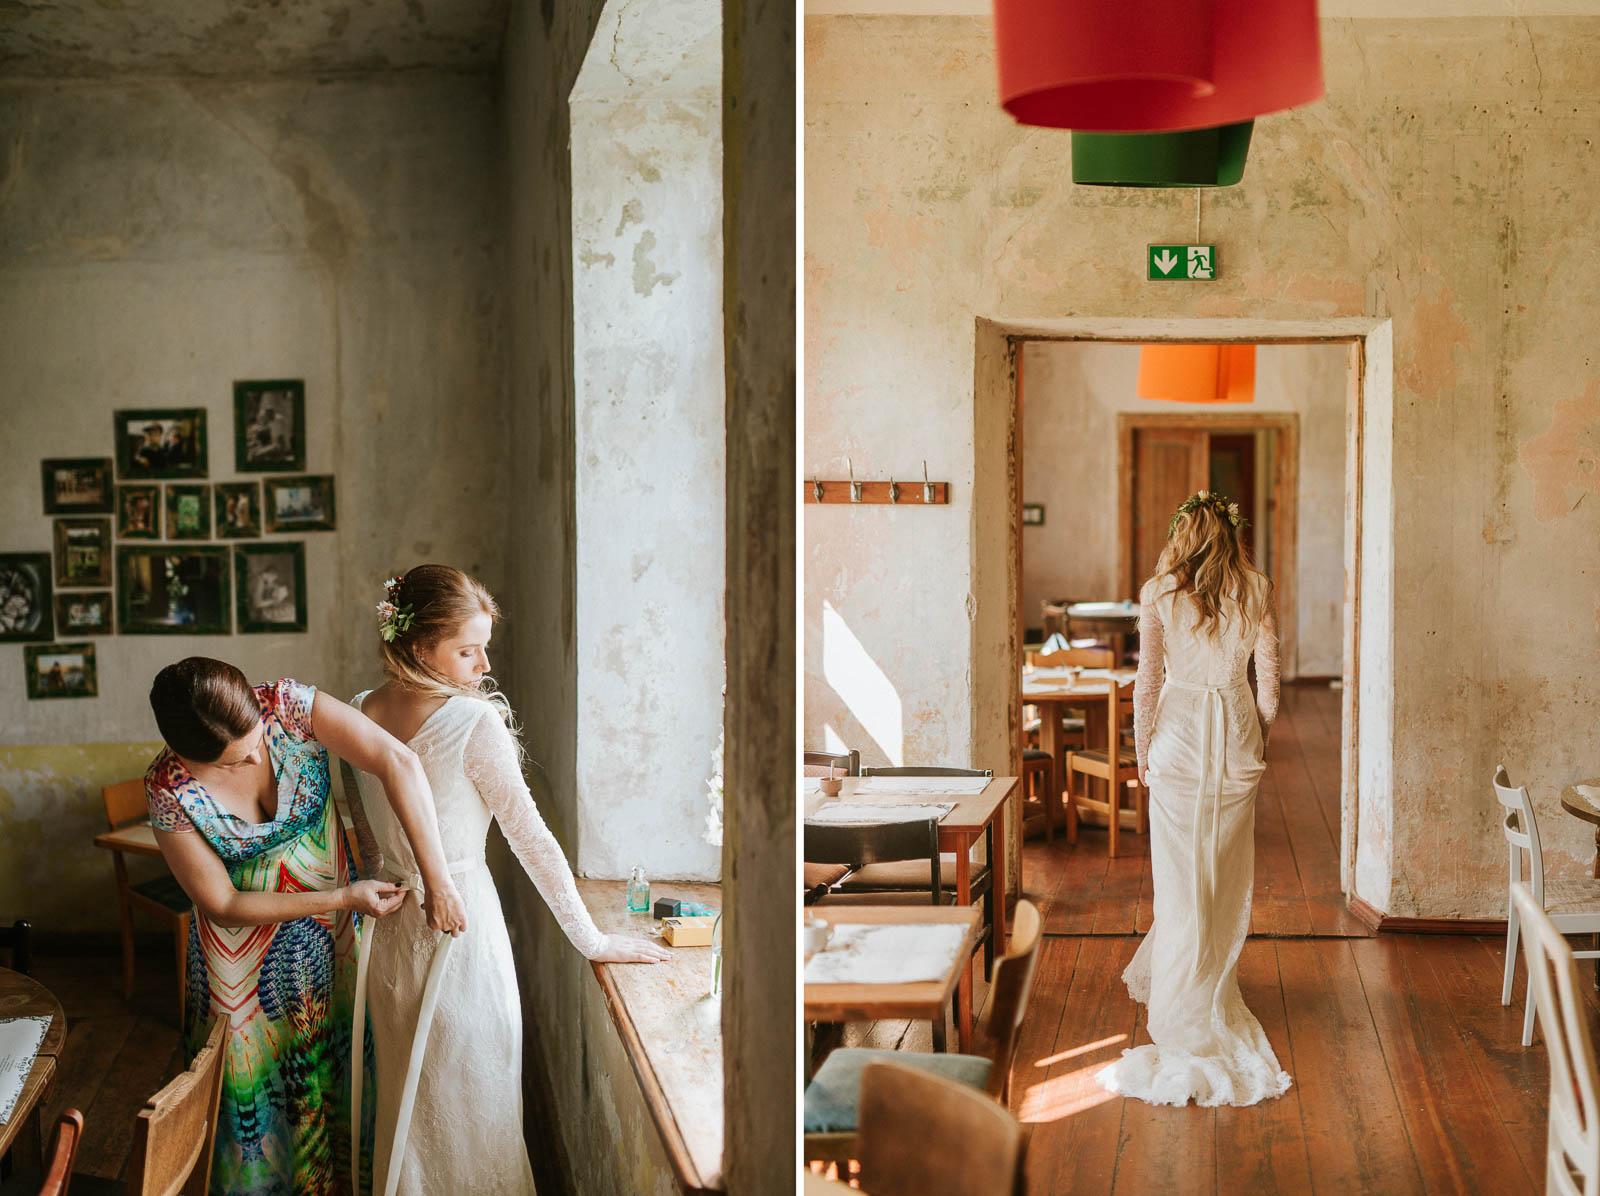 Pohjaka_mois_manor_pulm_wedding_Mait_Juriado-05